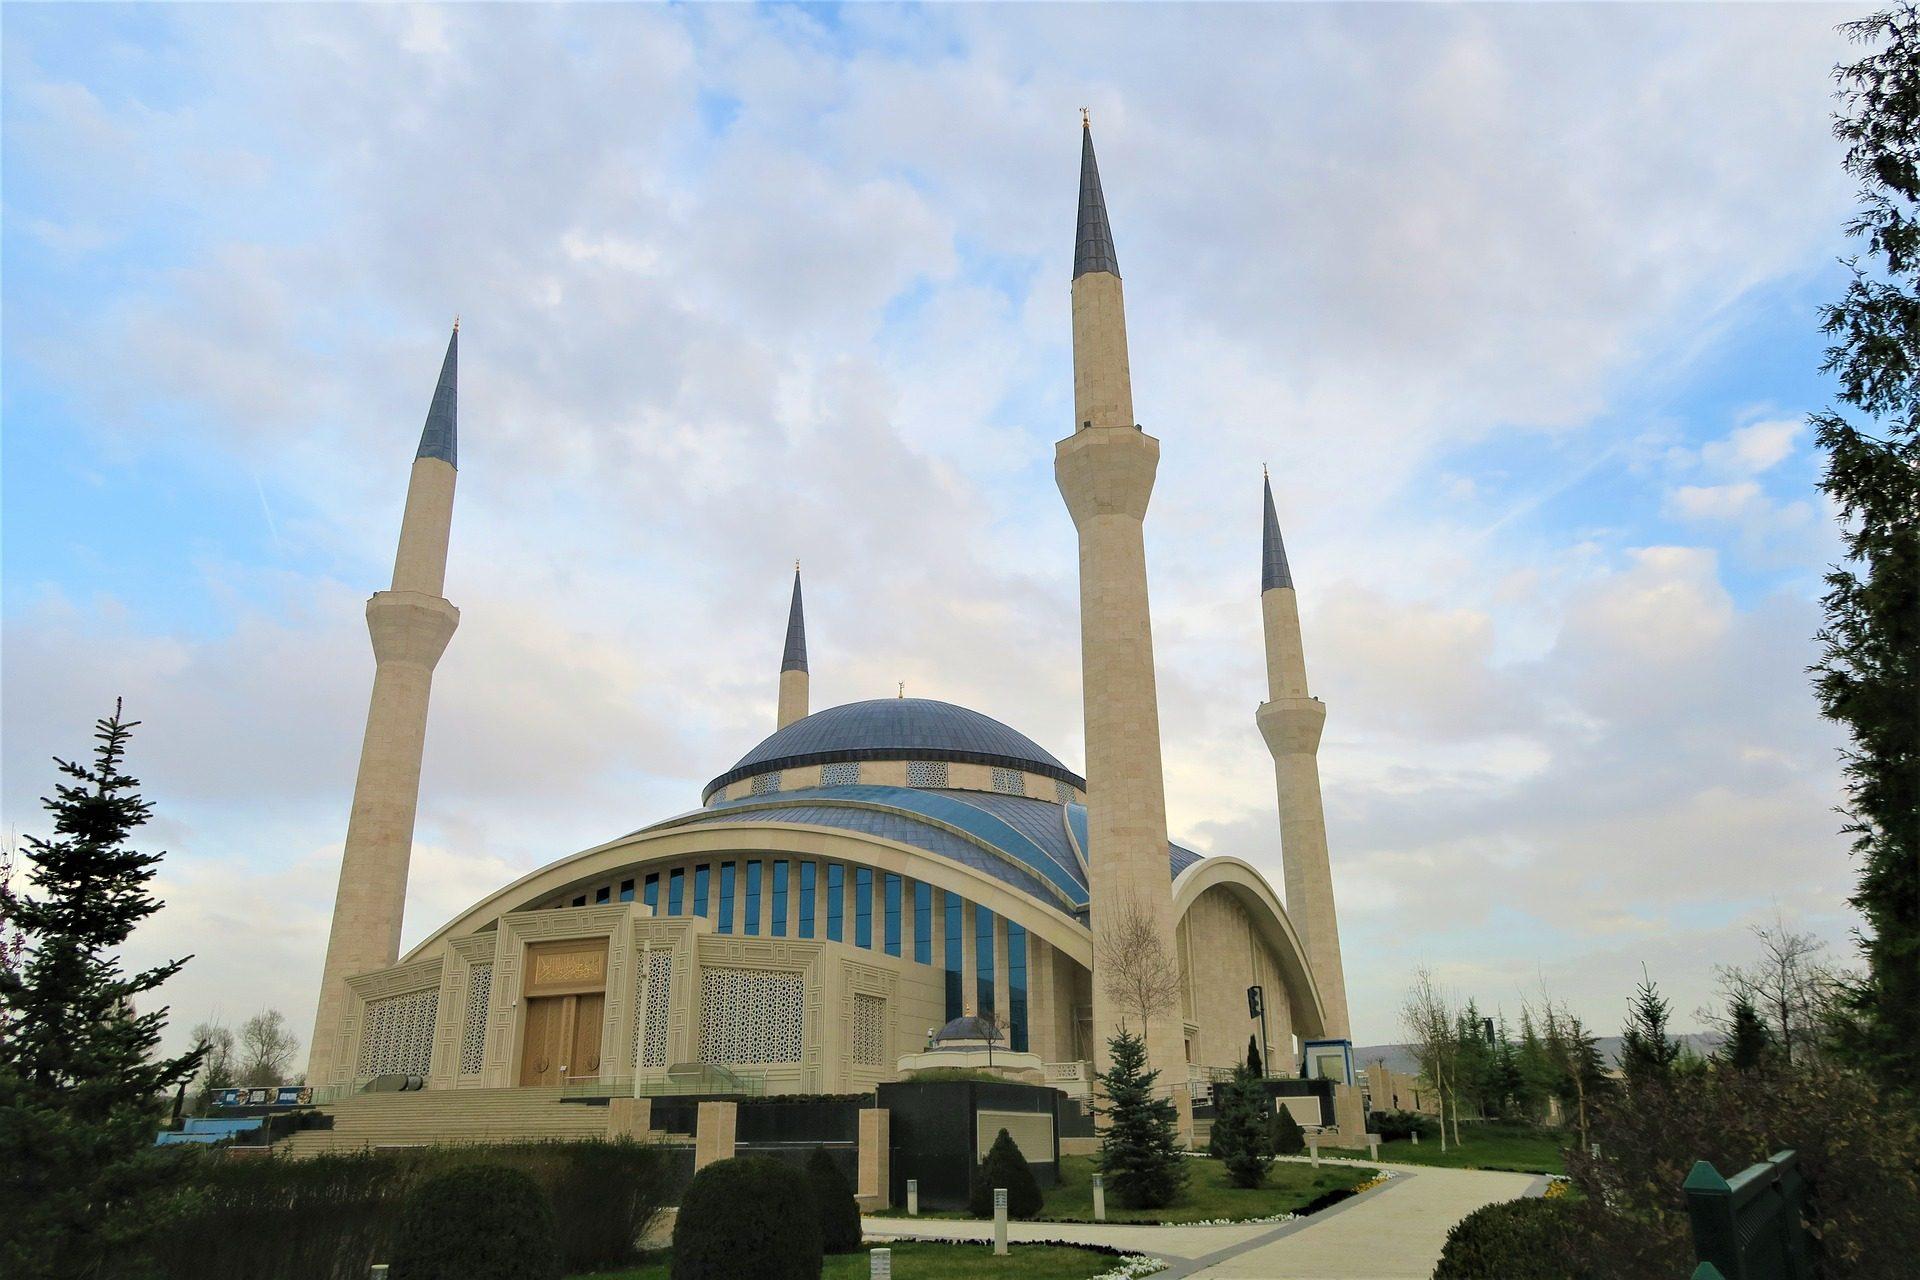 Kirche, Gebäude, Architektur, Torres, Religion, Minarett - Wallpaper HD - Prof.-falken.com